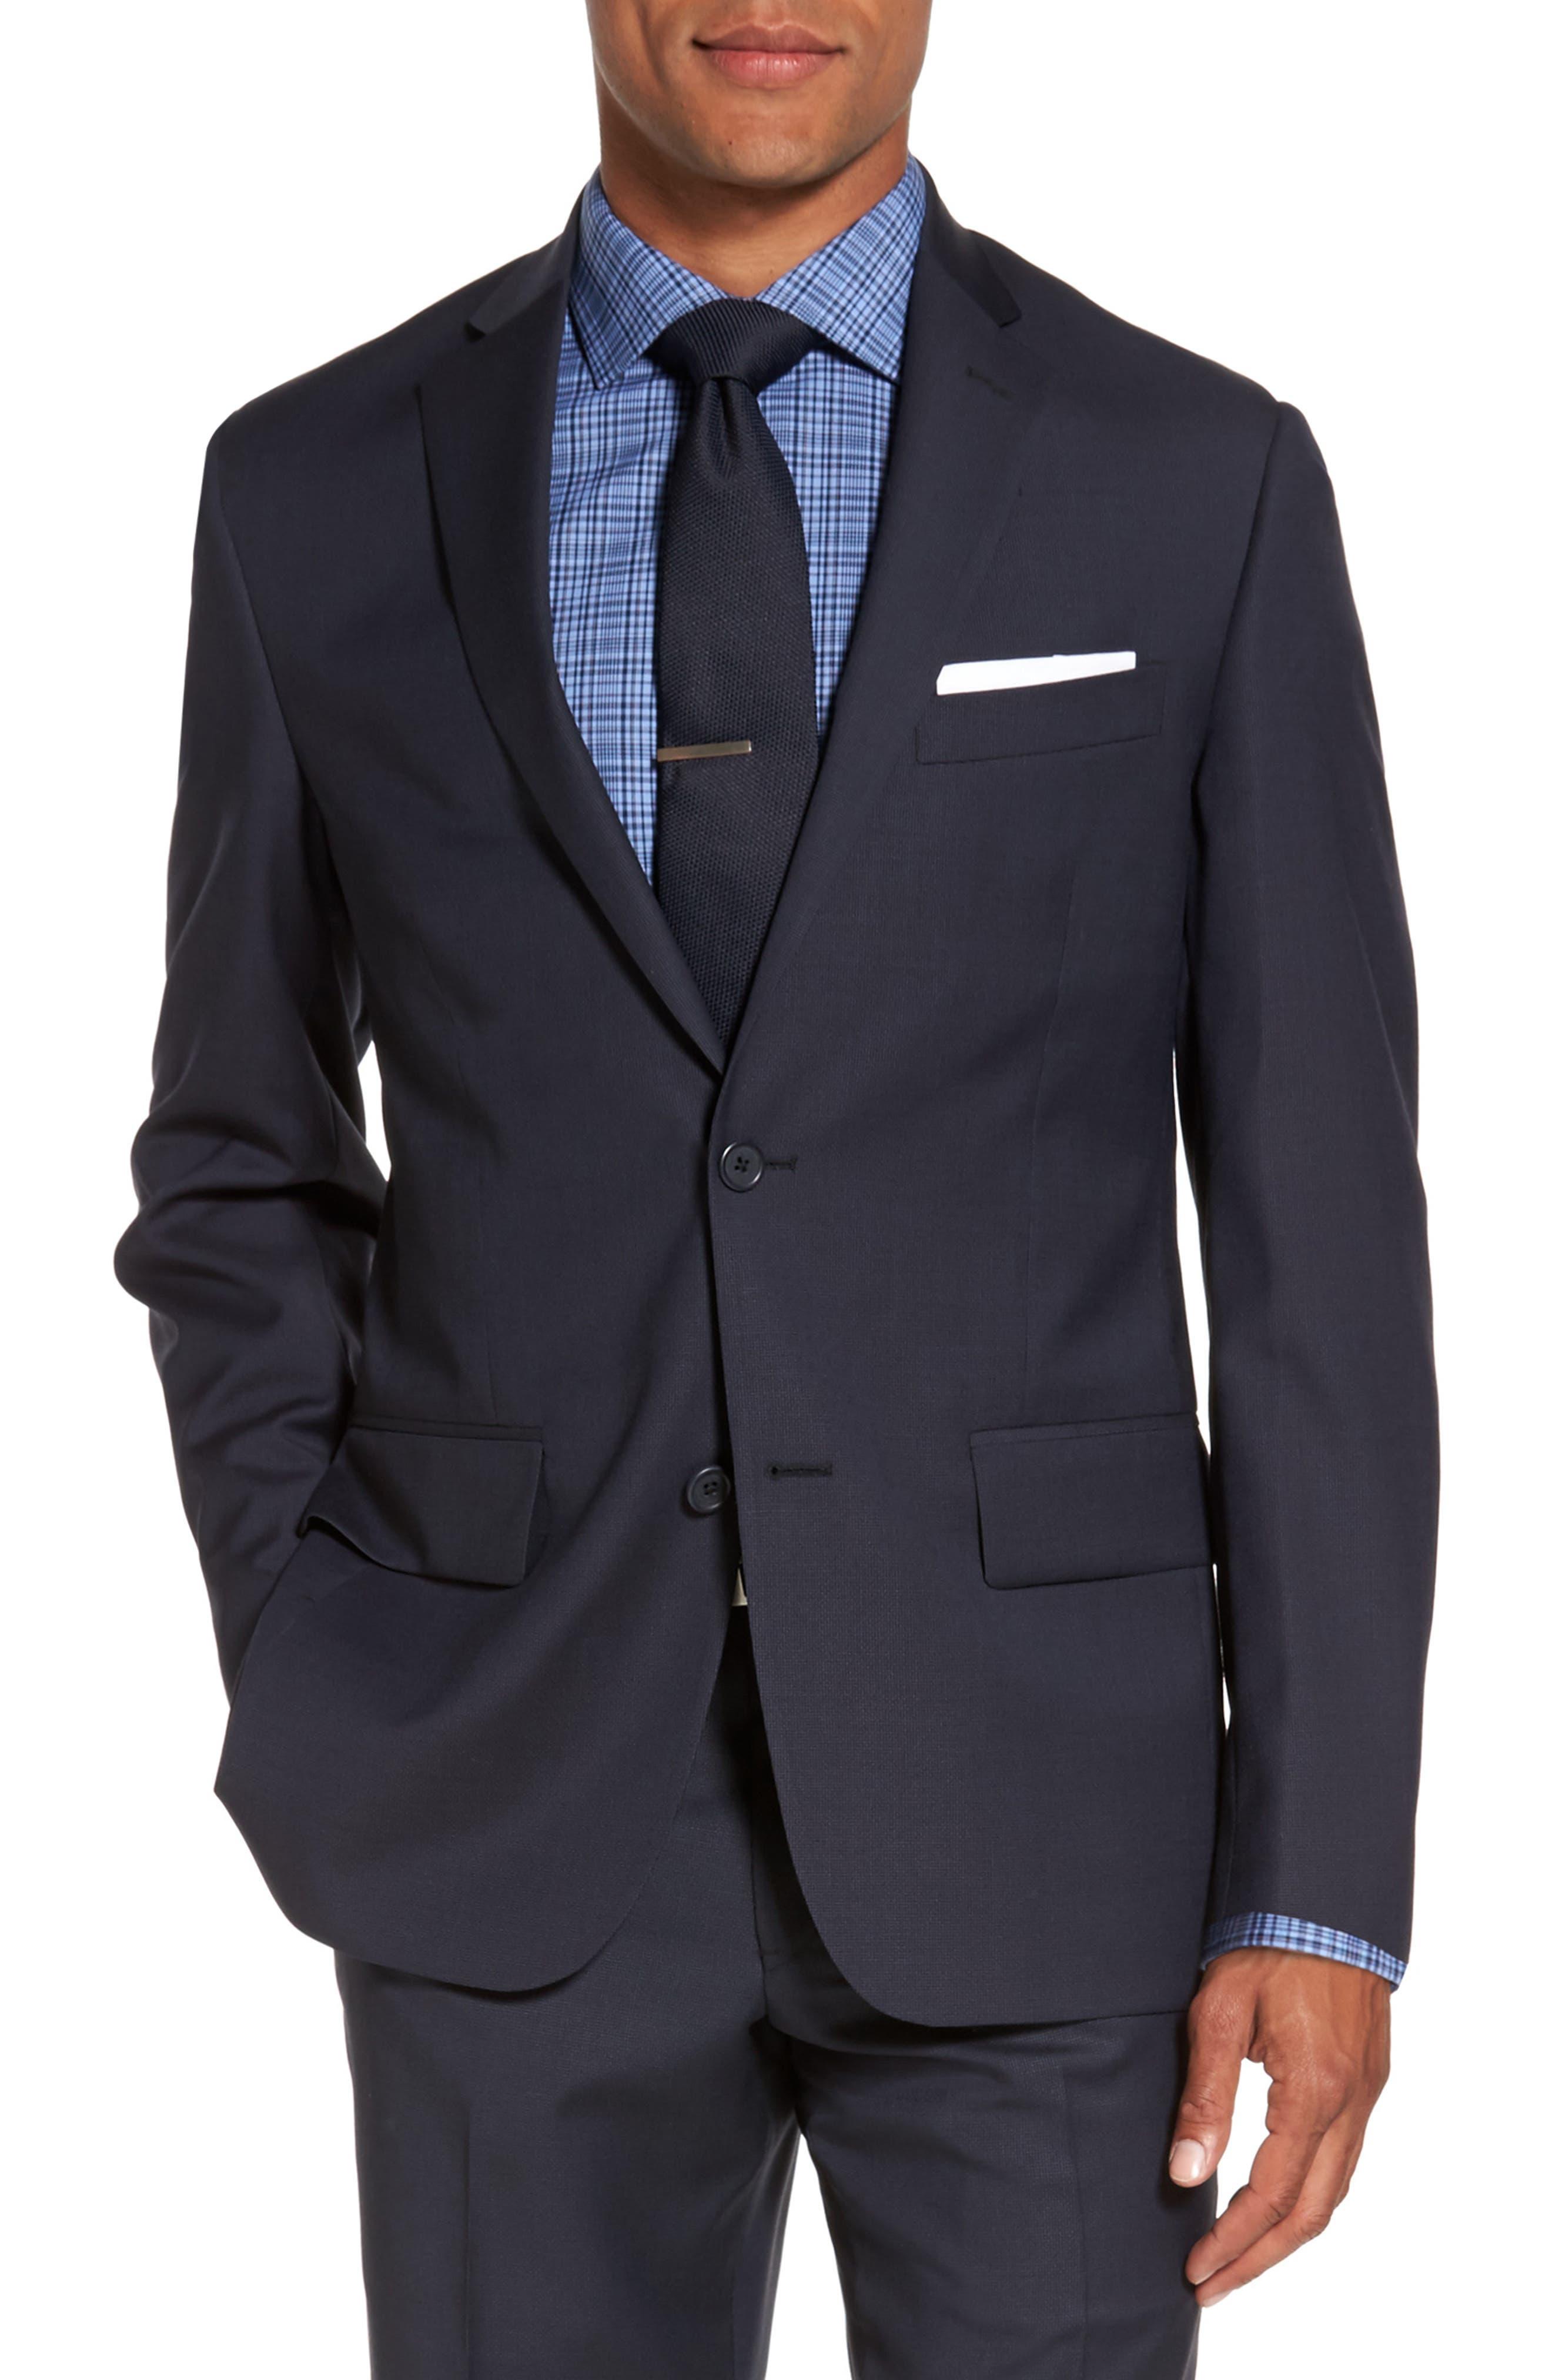 Main Image - Nordstrom Men's Shop Classic Fit Solid Wool Sport Coat